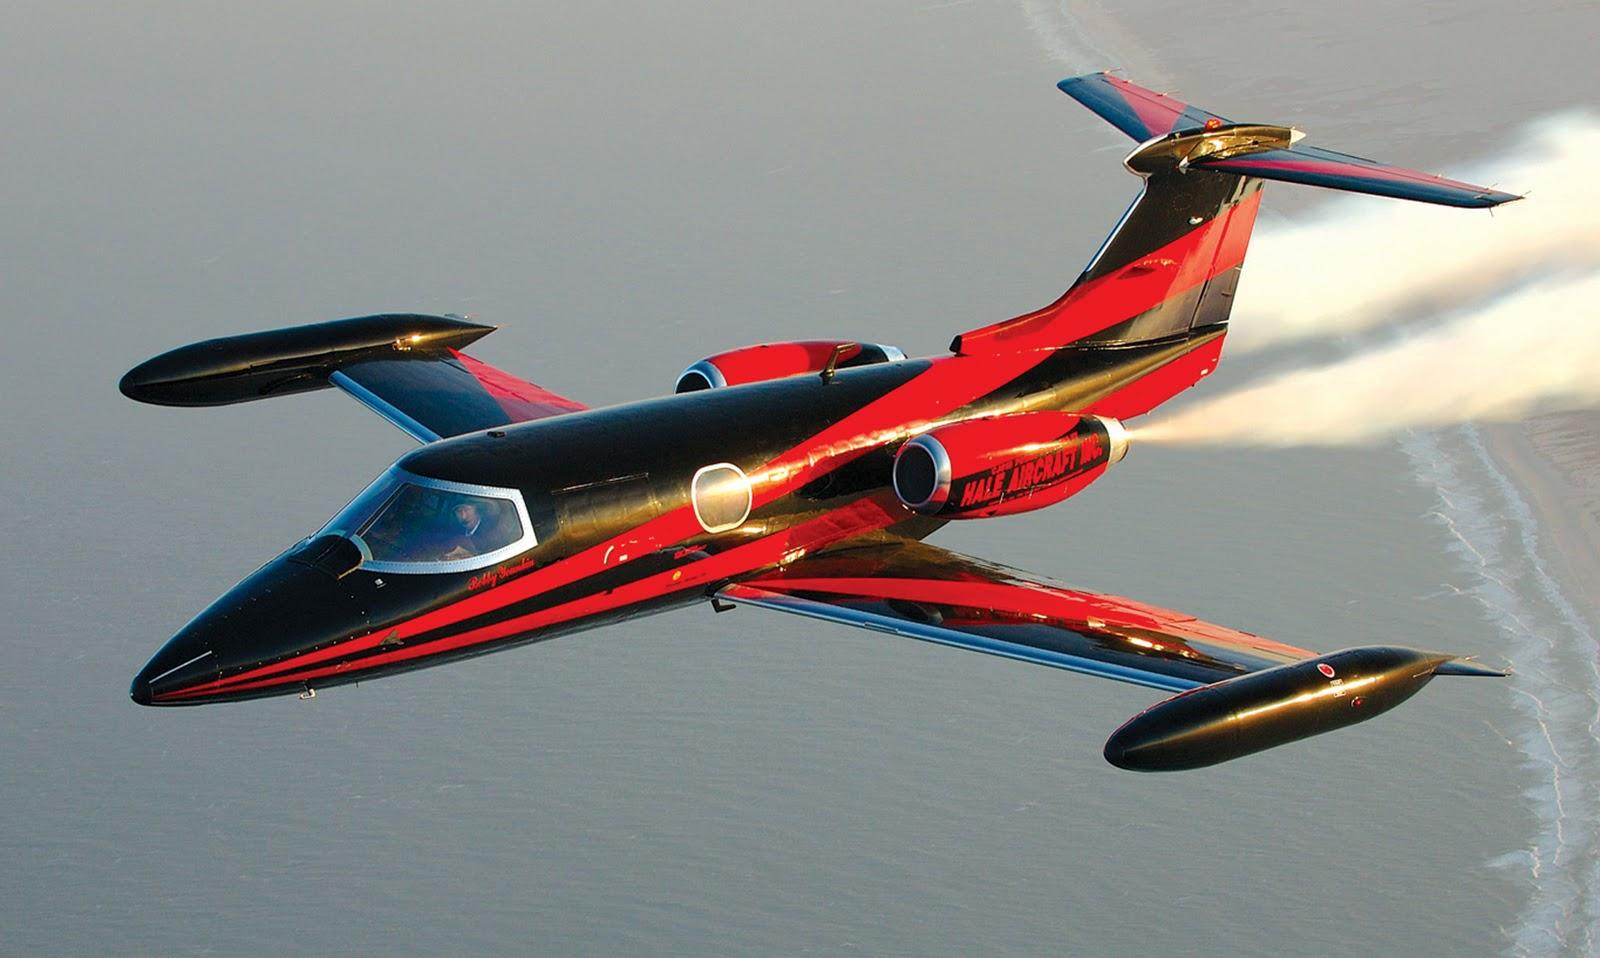 Cultura Aeron 225 Utica Learjet 23 O Av 244 De Todos Os Jatos